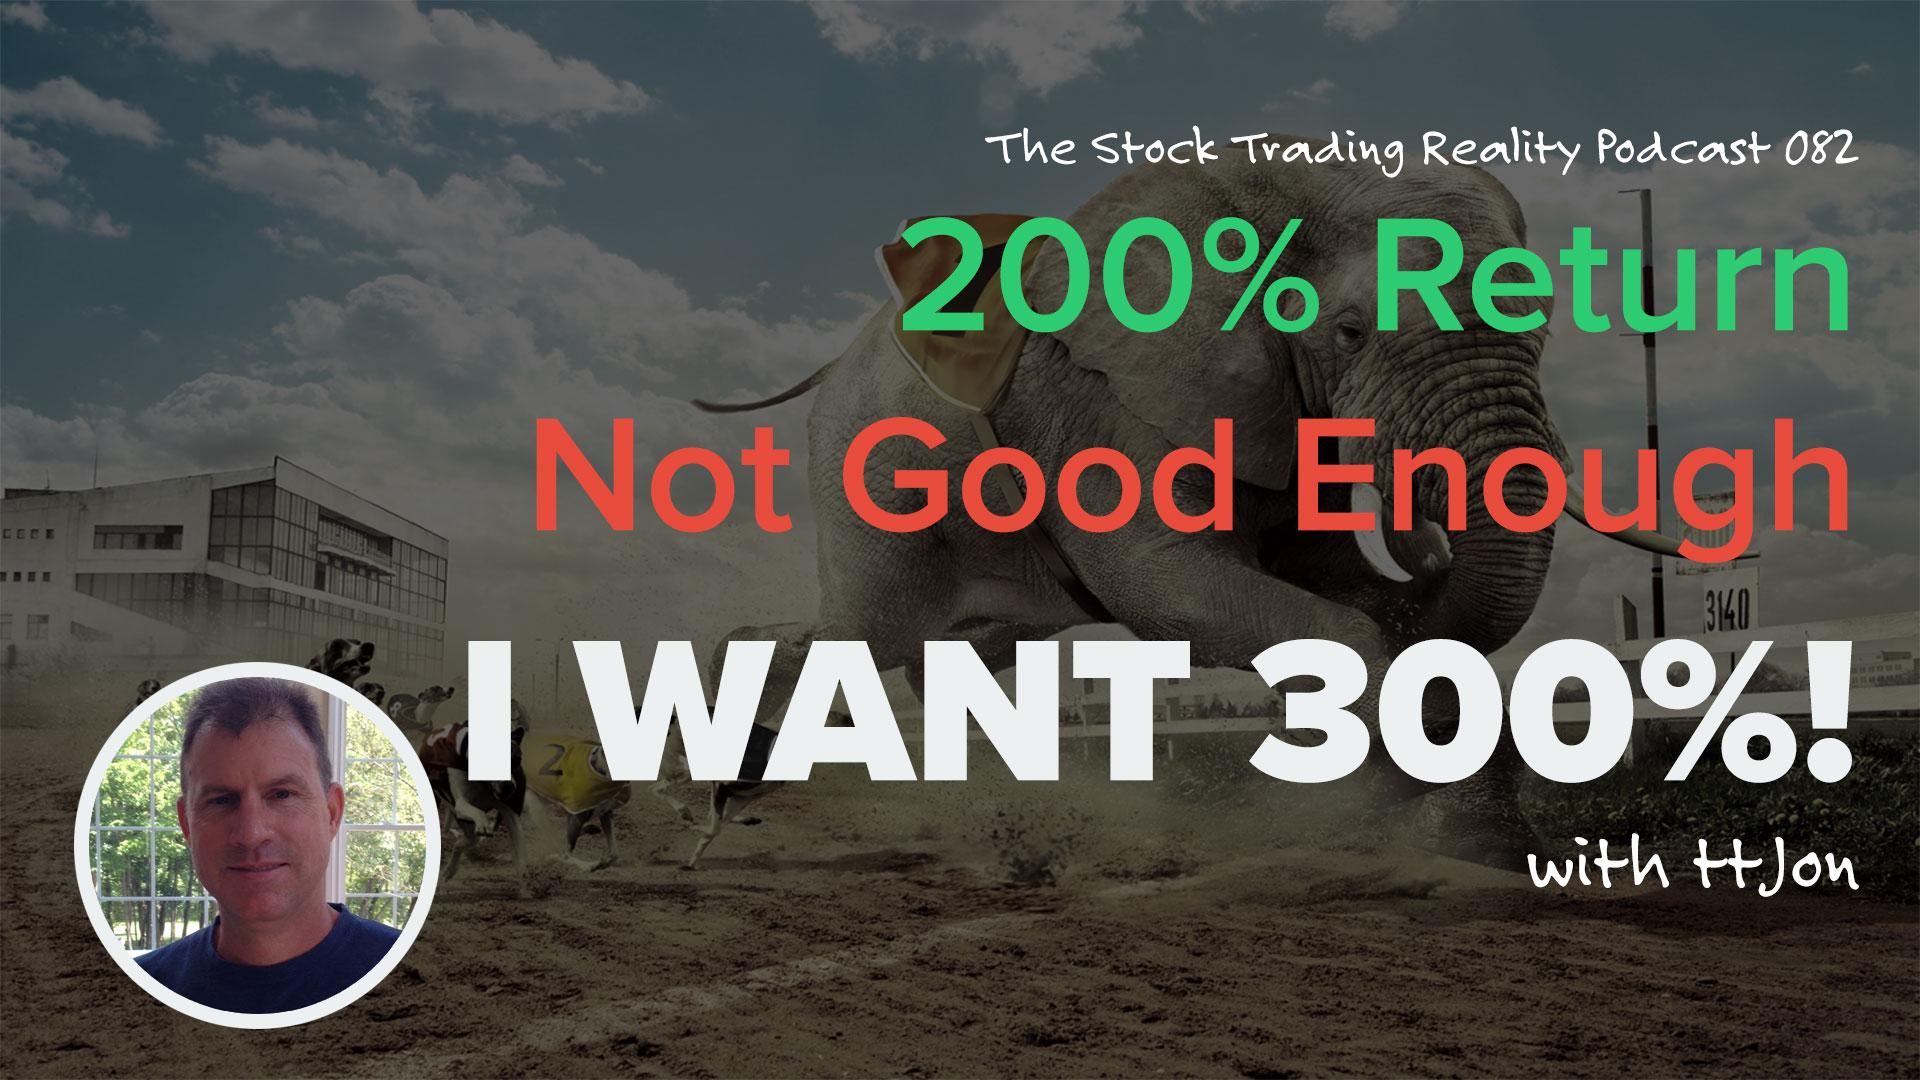 STR 082: 200% Return Not Good Enough. I Want 300%!